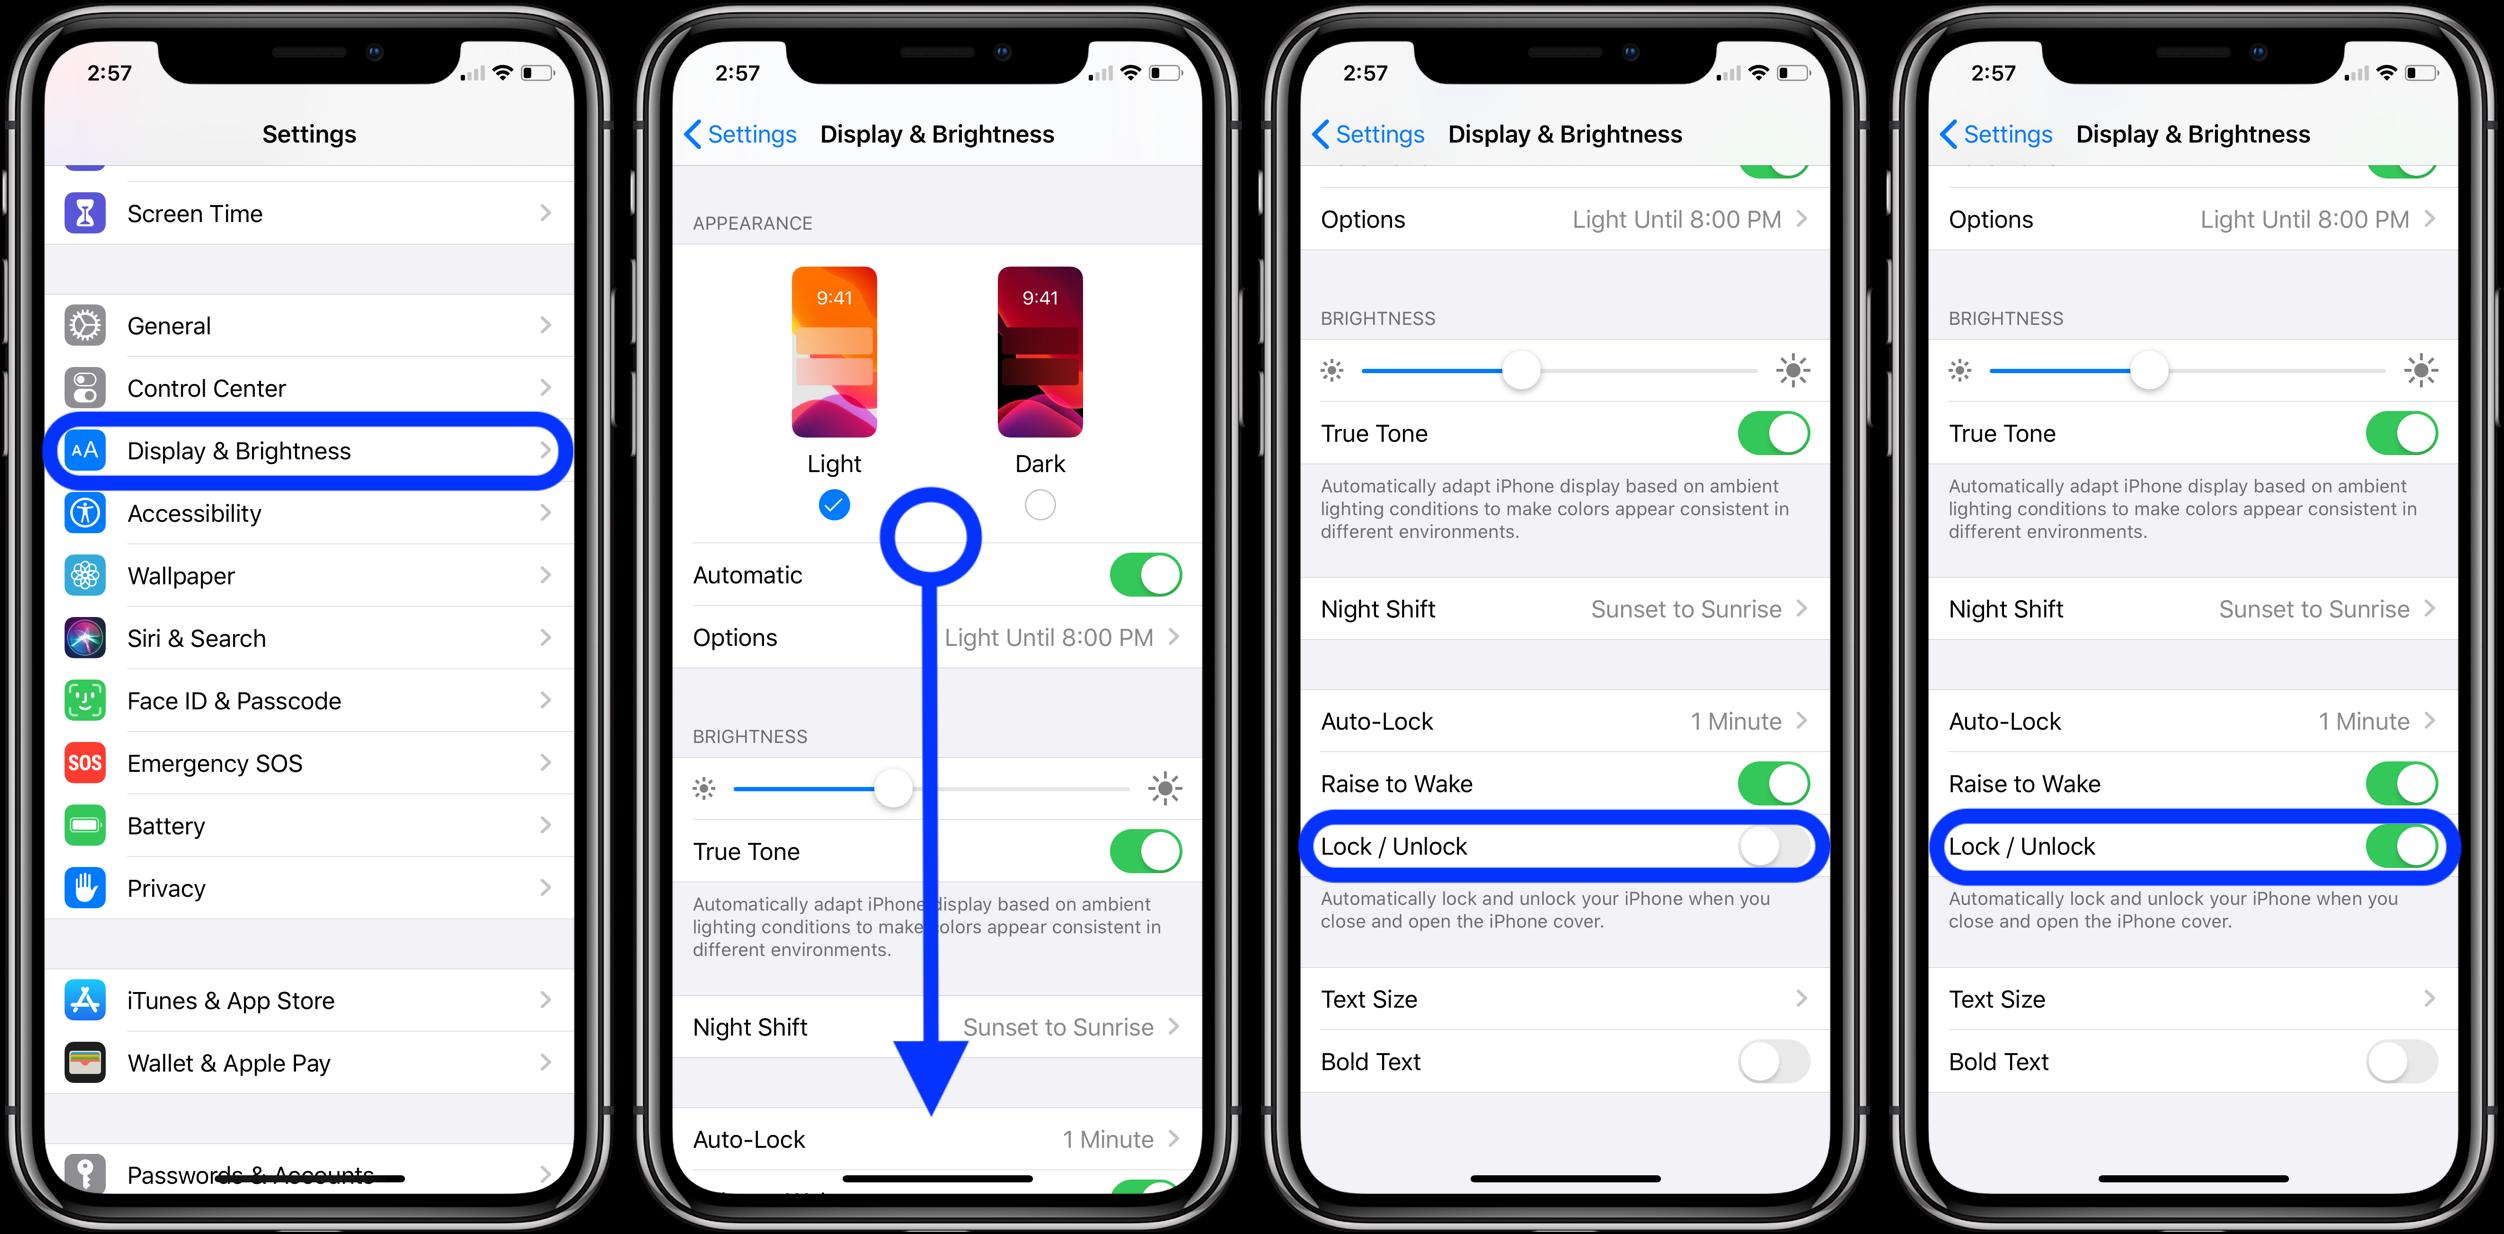 iPhone 如何实现自动锁定和解锁?